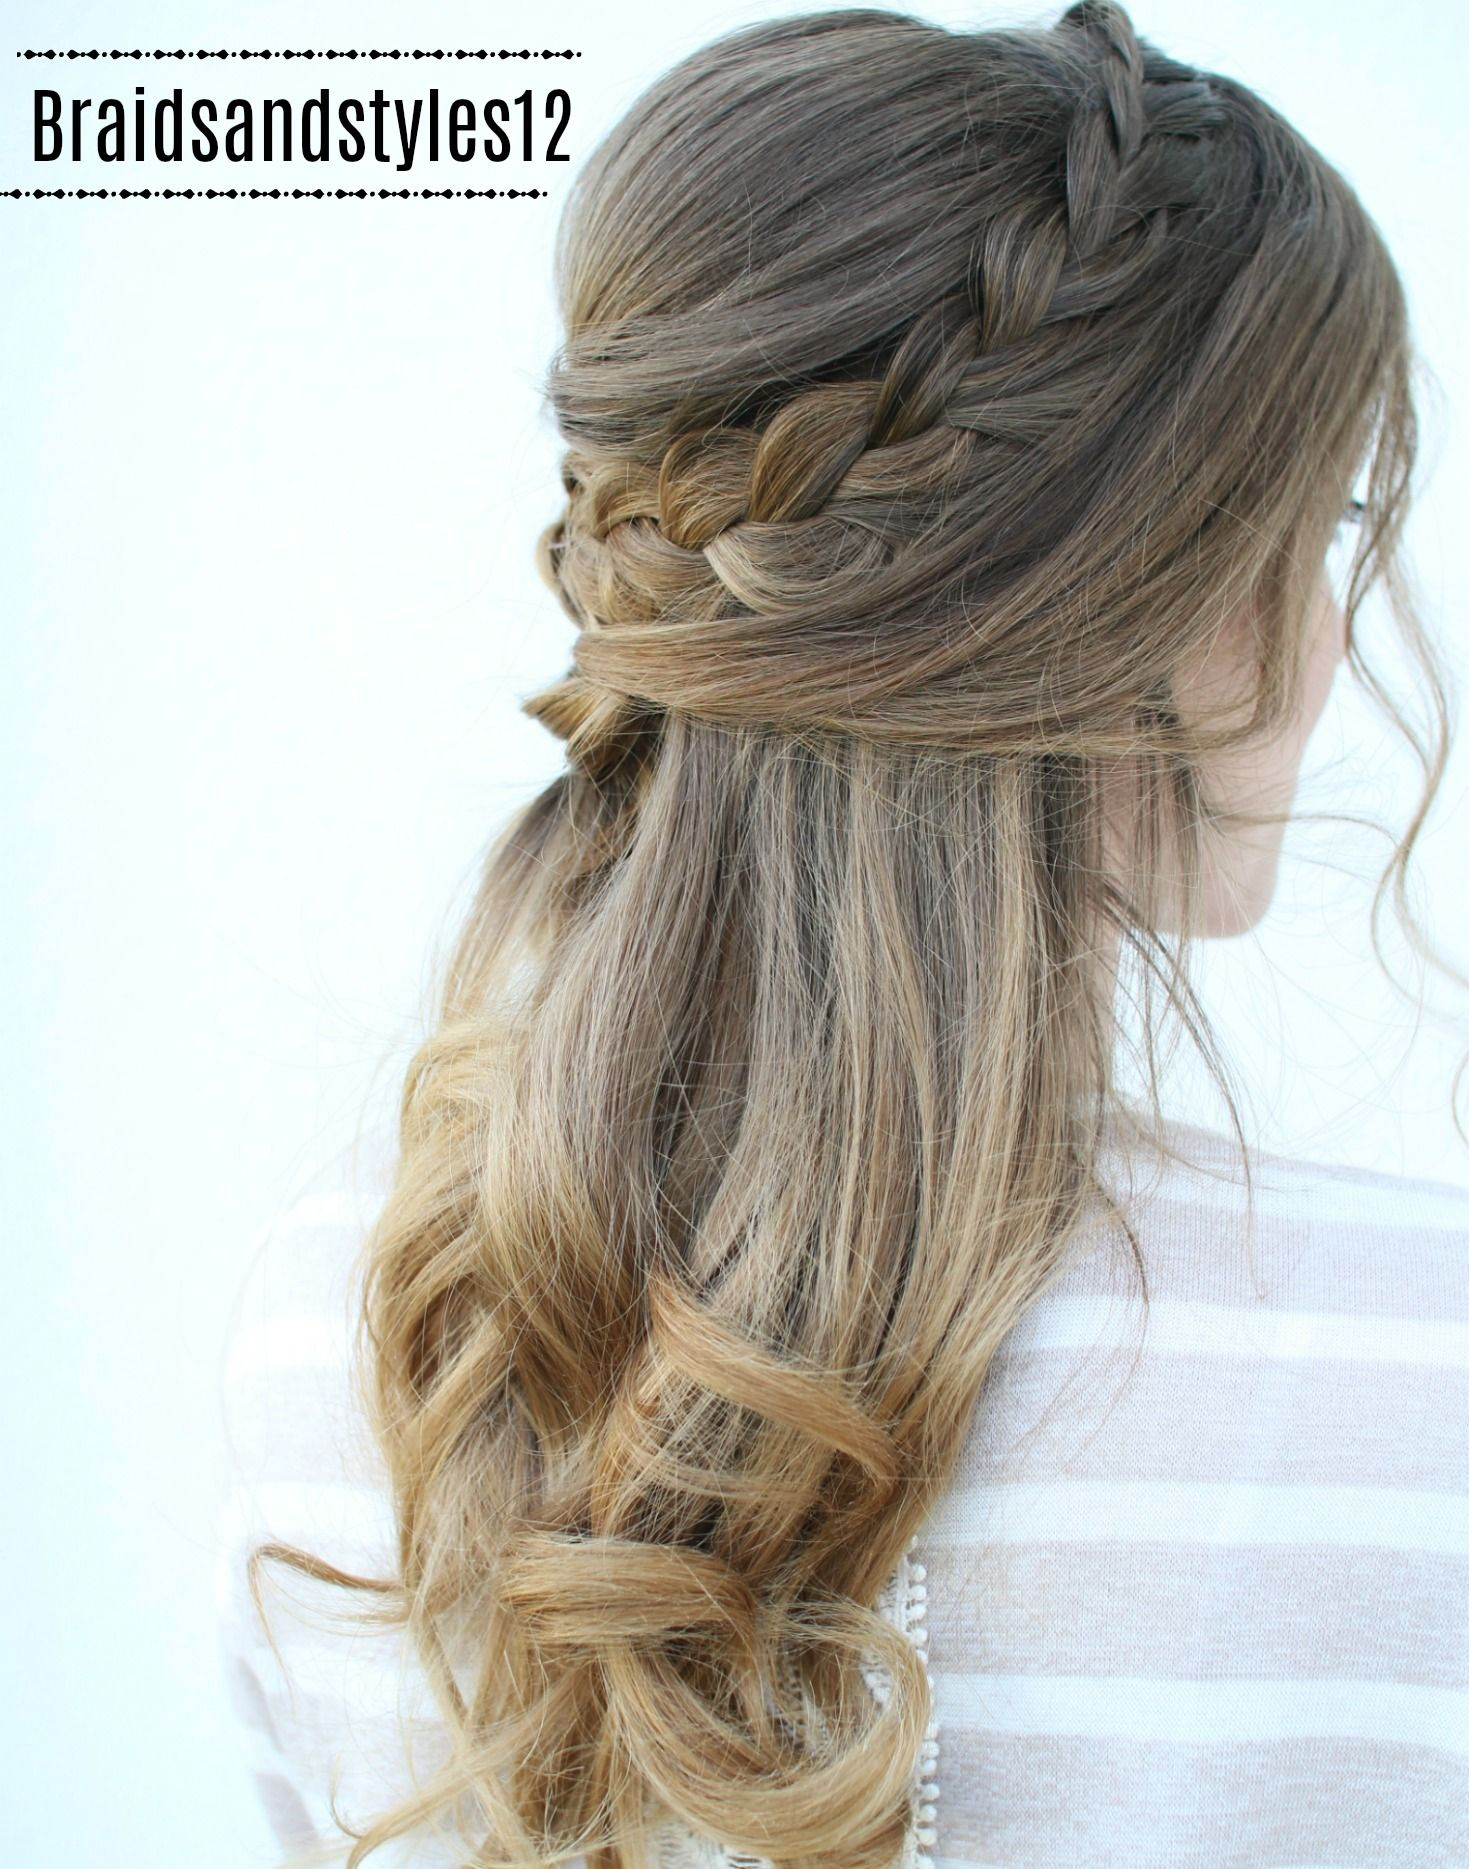 Romantic half up braided hairstyles by braidsandstyles half up